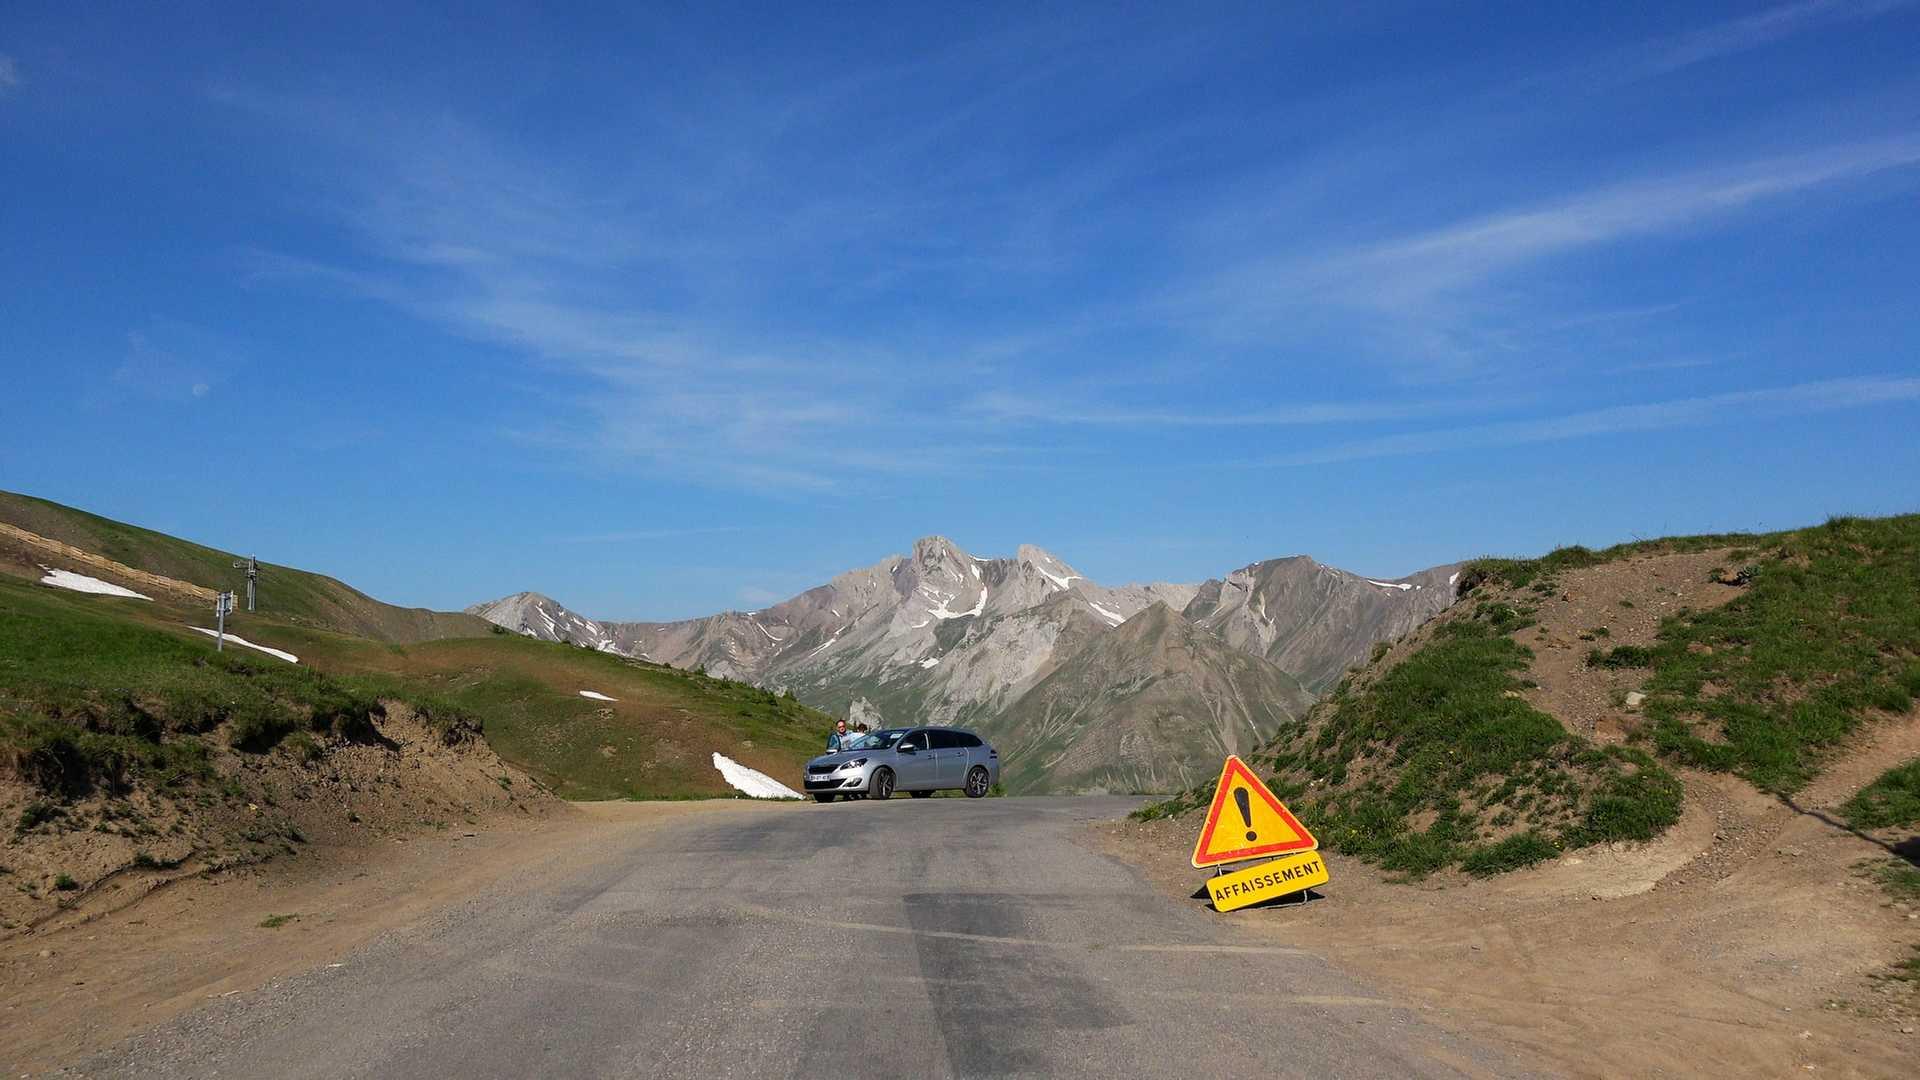 Part 4 of Mercantour Loop Grand Tour Thumbnail